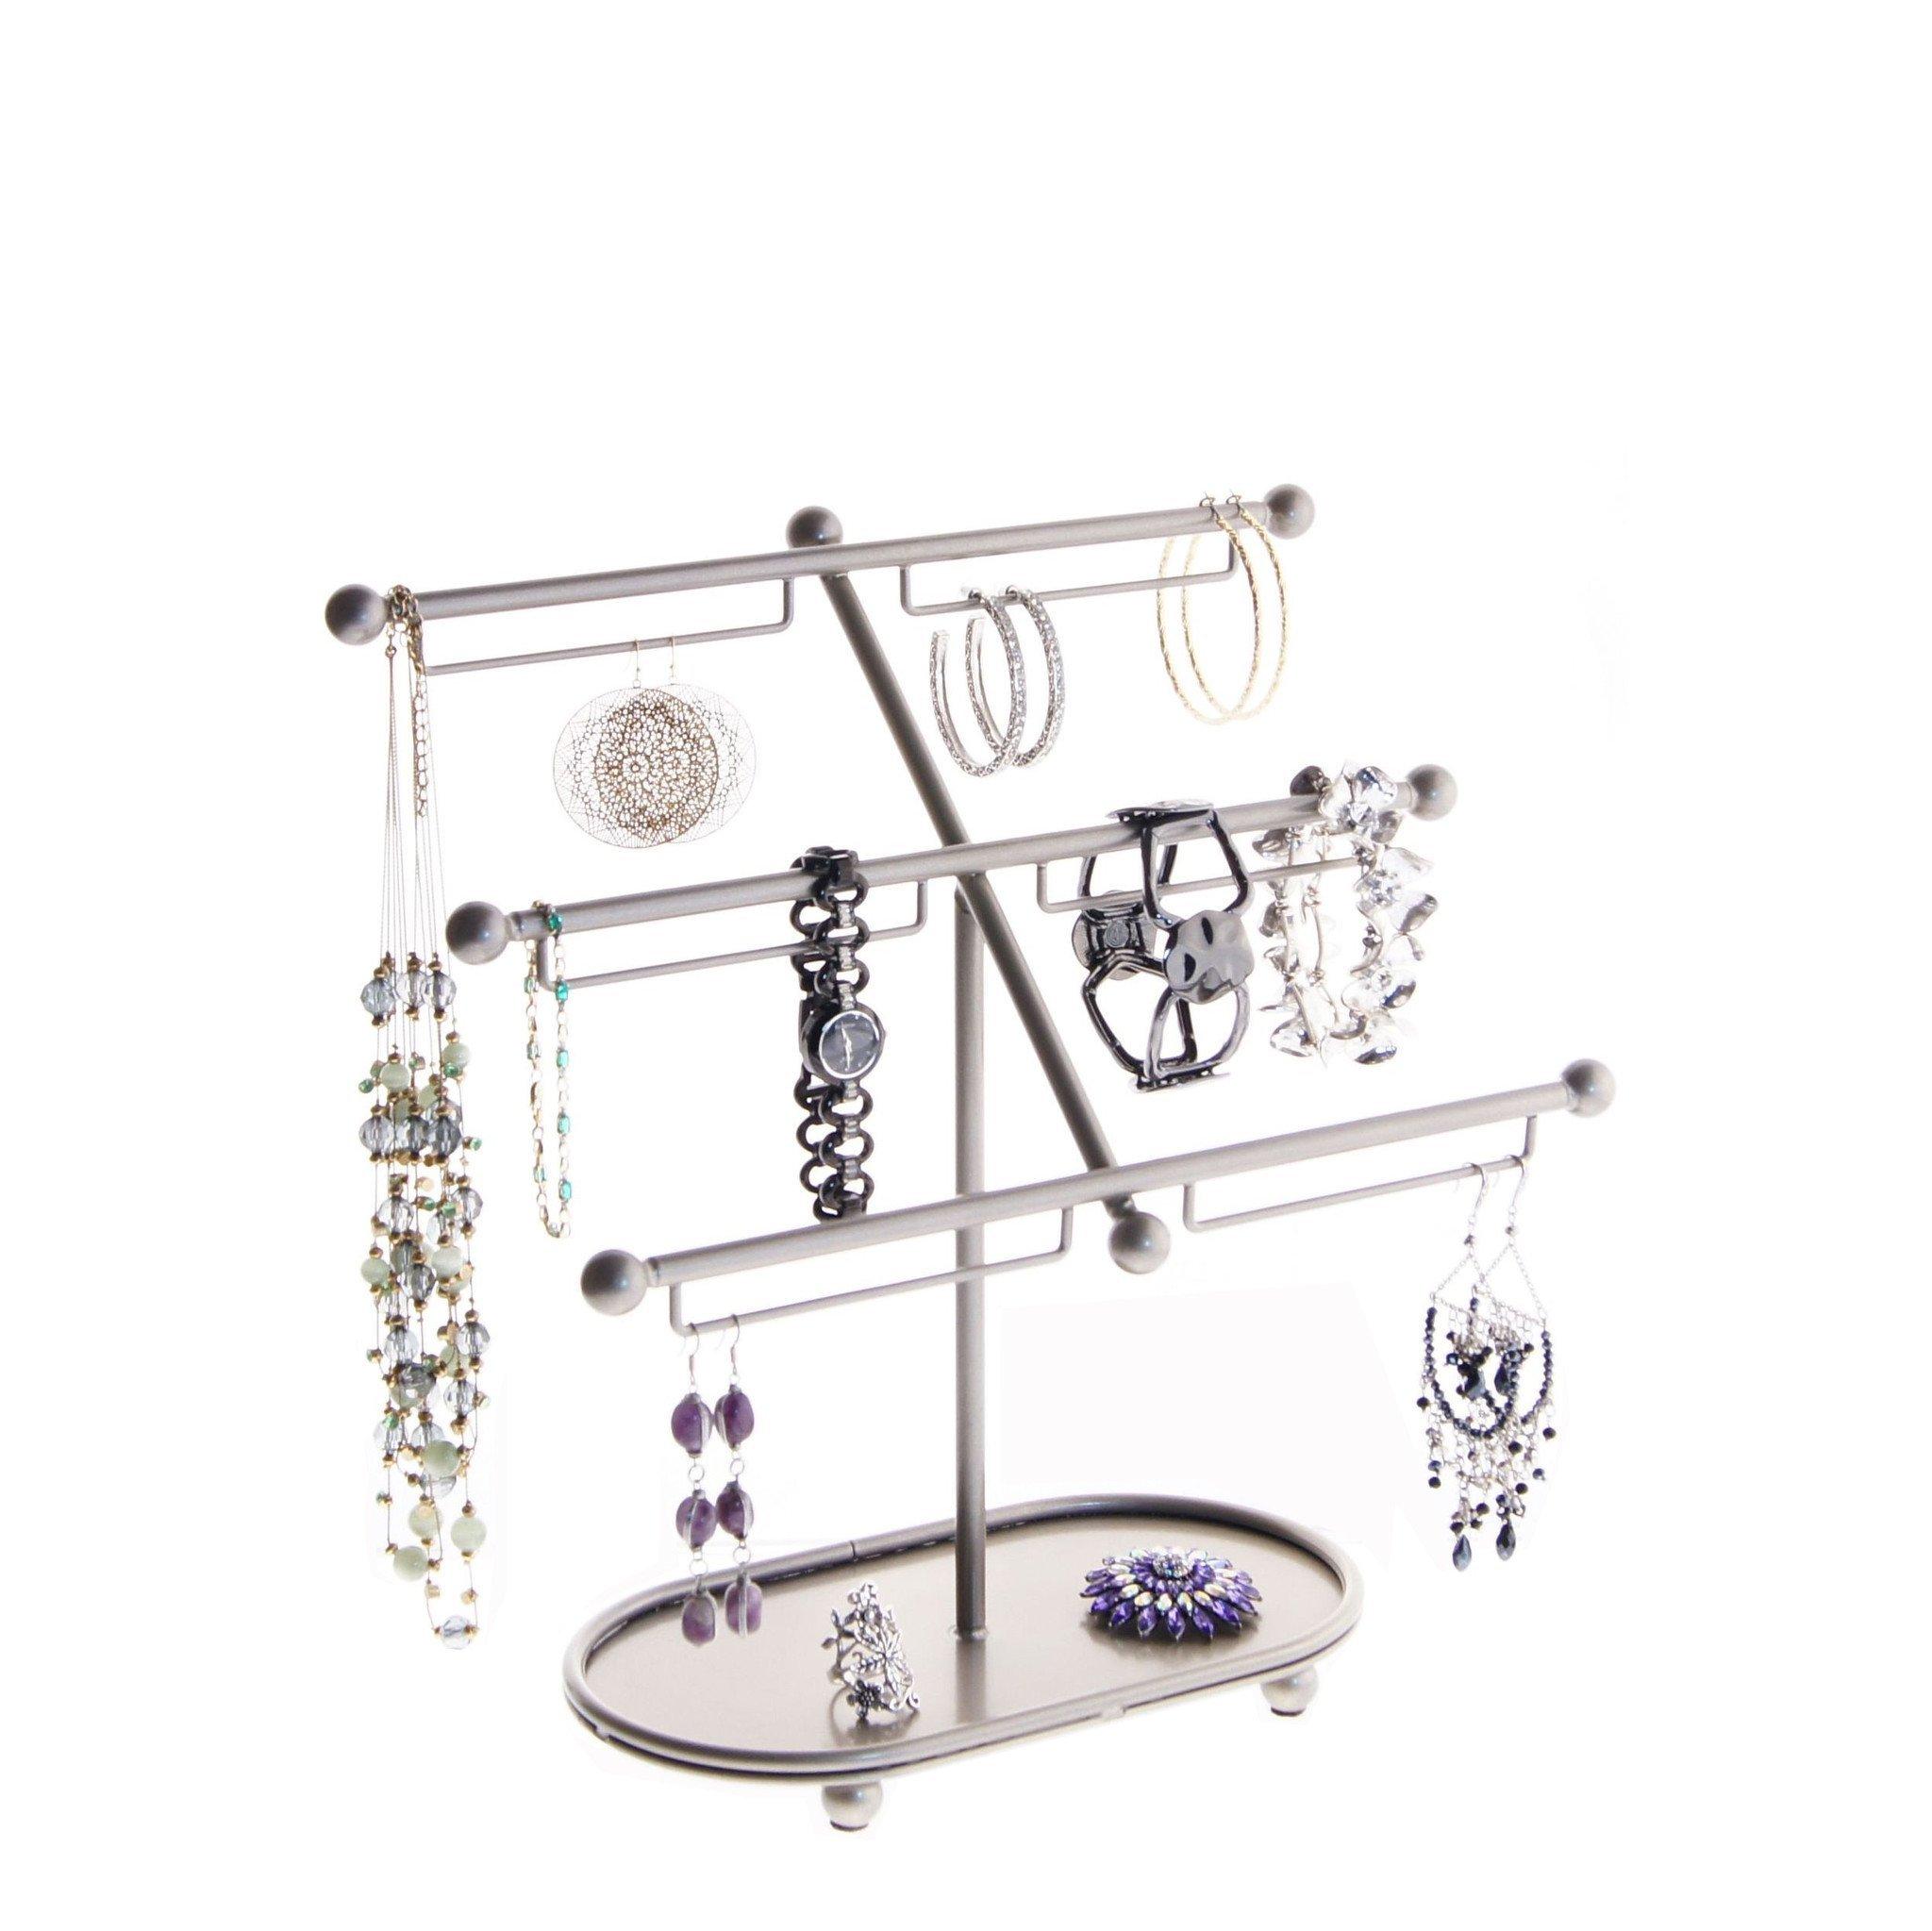 Angelynn's Jewelry Holder Earring Organizer Tree Stand Bracelet Storage Rack, Isabel Satin Nickel Silver